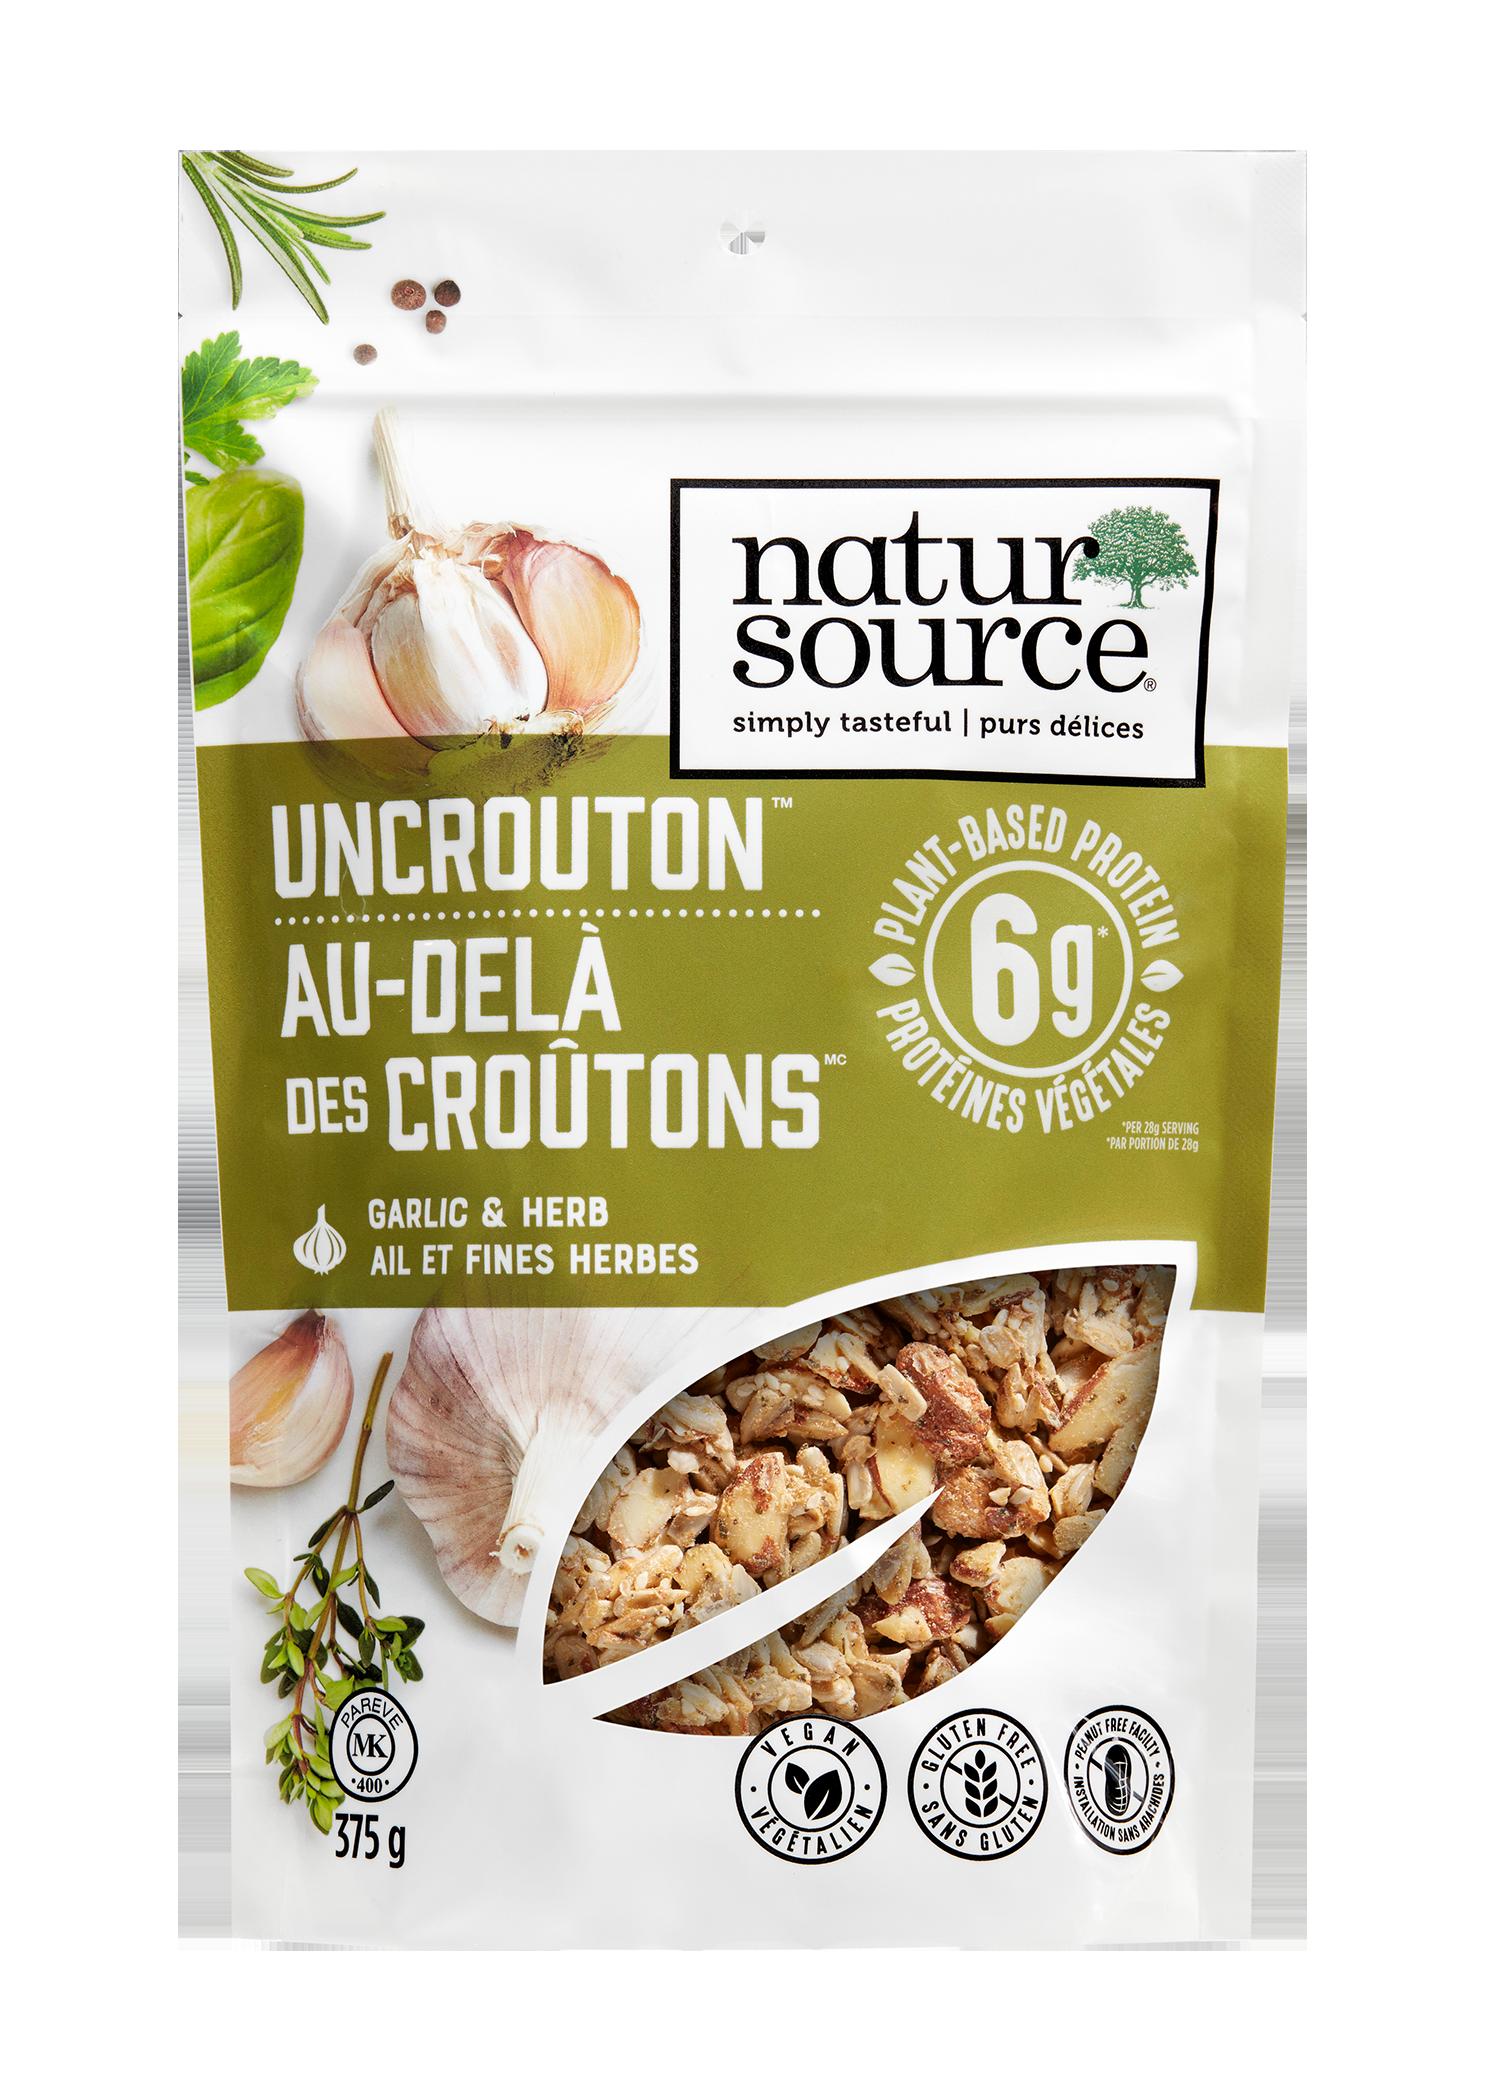 natursource vegan-friendly Garlic & Herb Uncrouton™